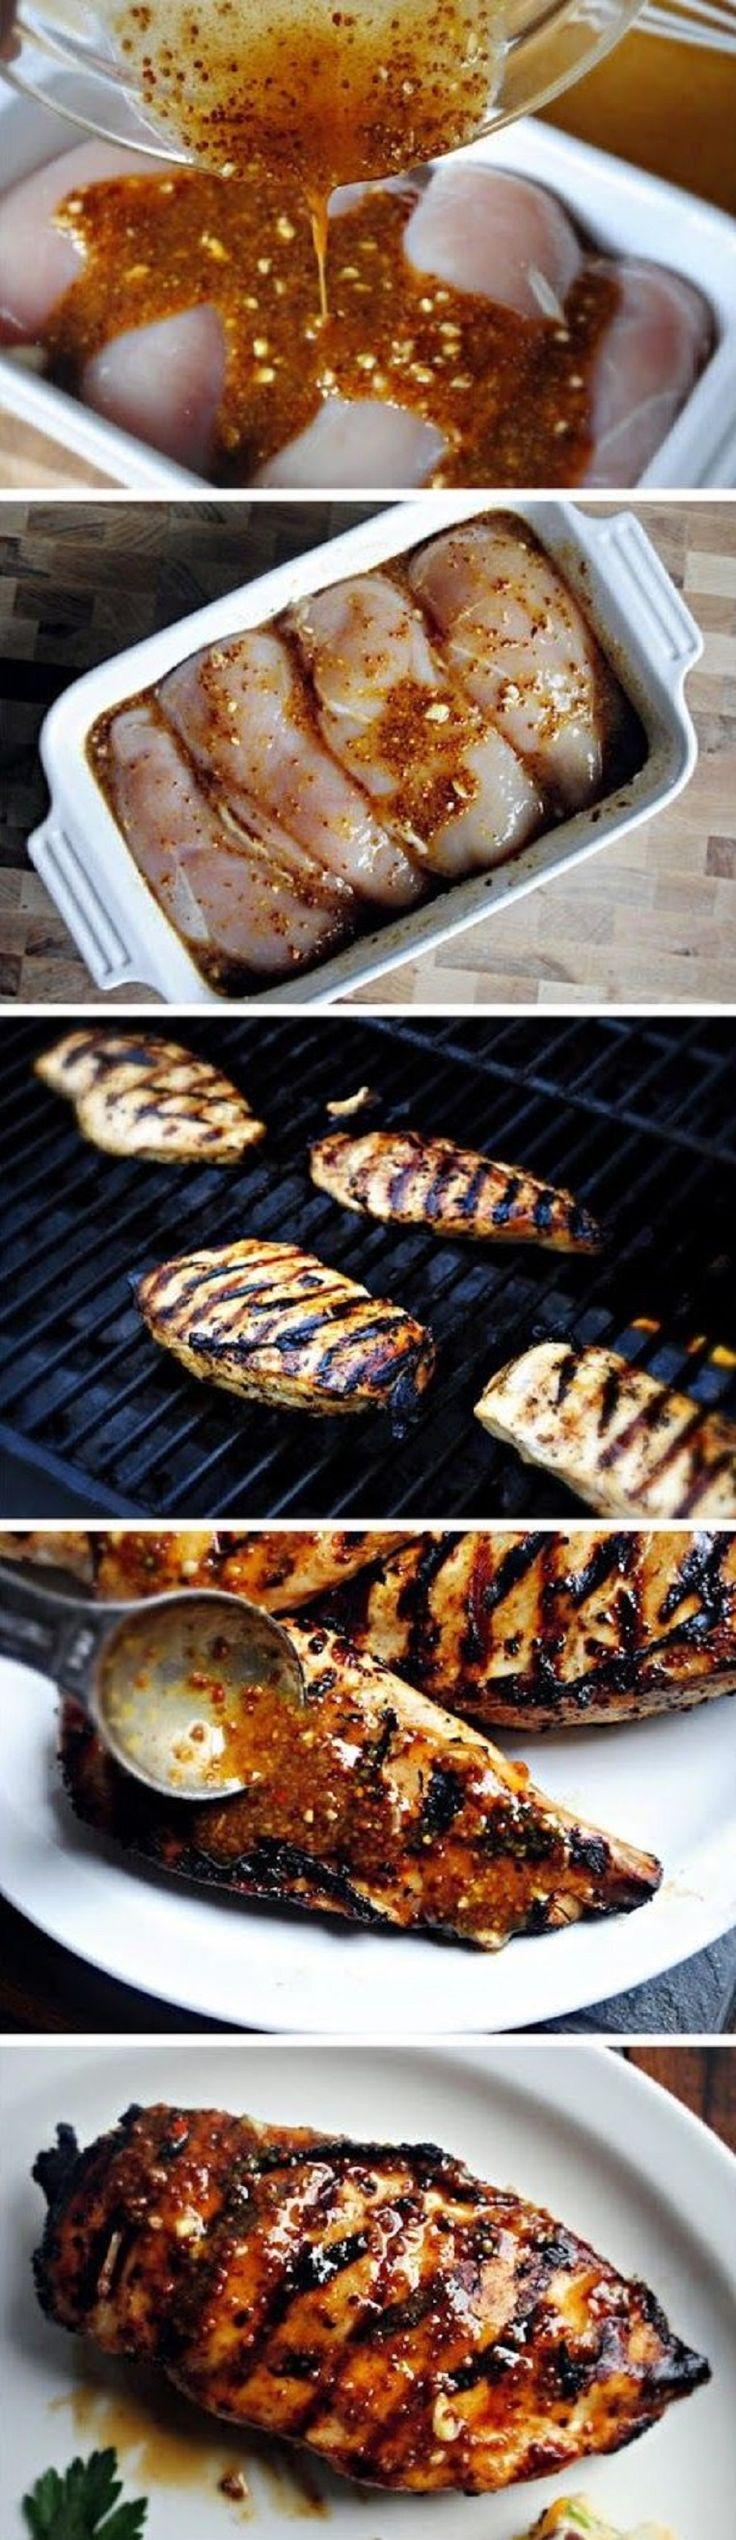 Grilled Honey Mustard Chicken - 15 Grilled Chicken Recipes to Make This Summer | GleamItUp